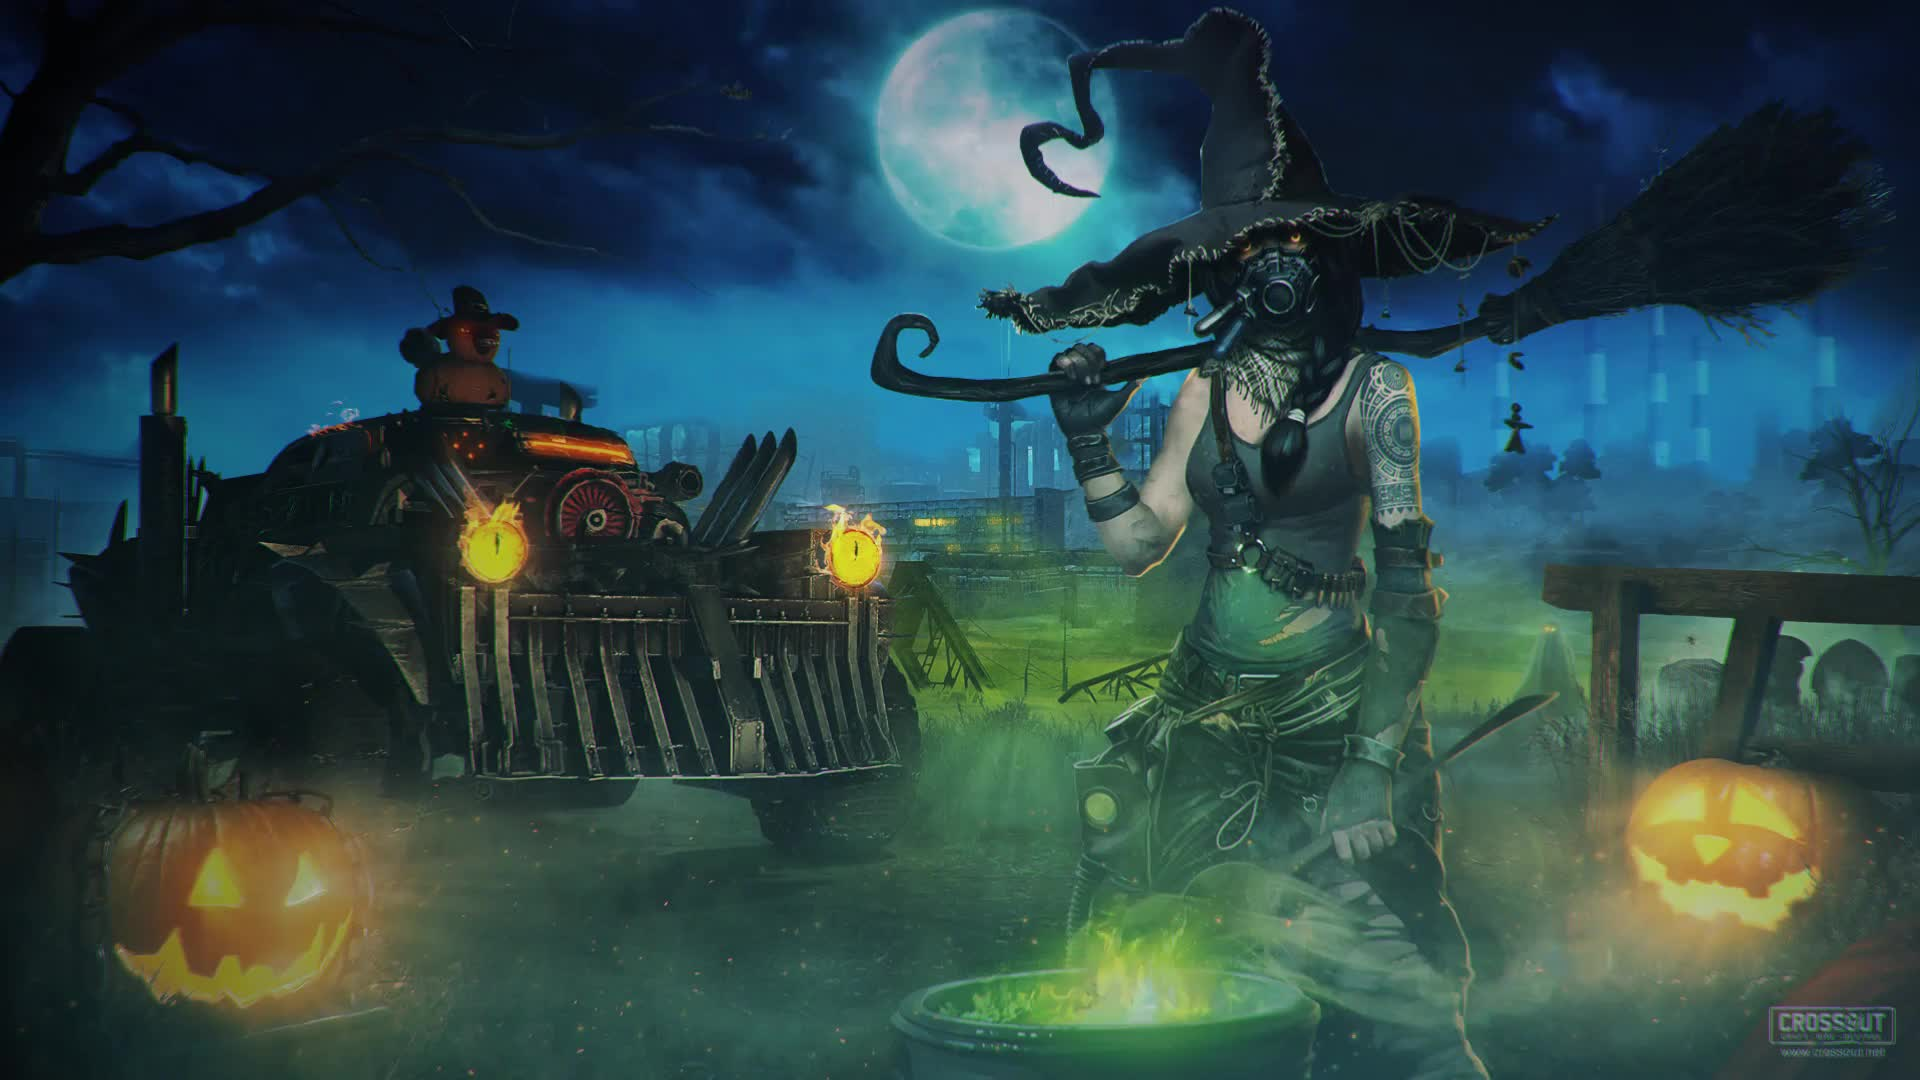 Crossout Хеллоуин интерпретация - живые обои